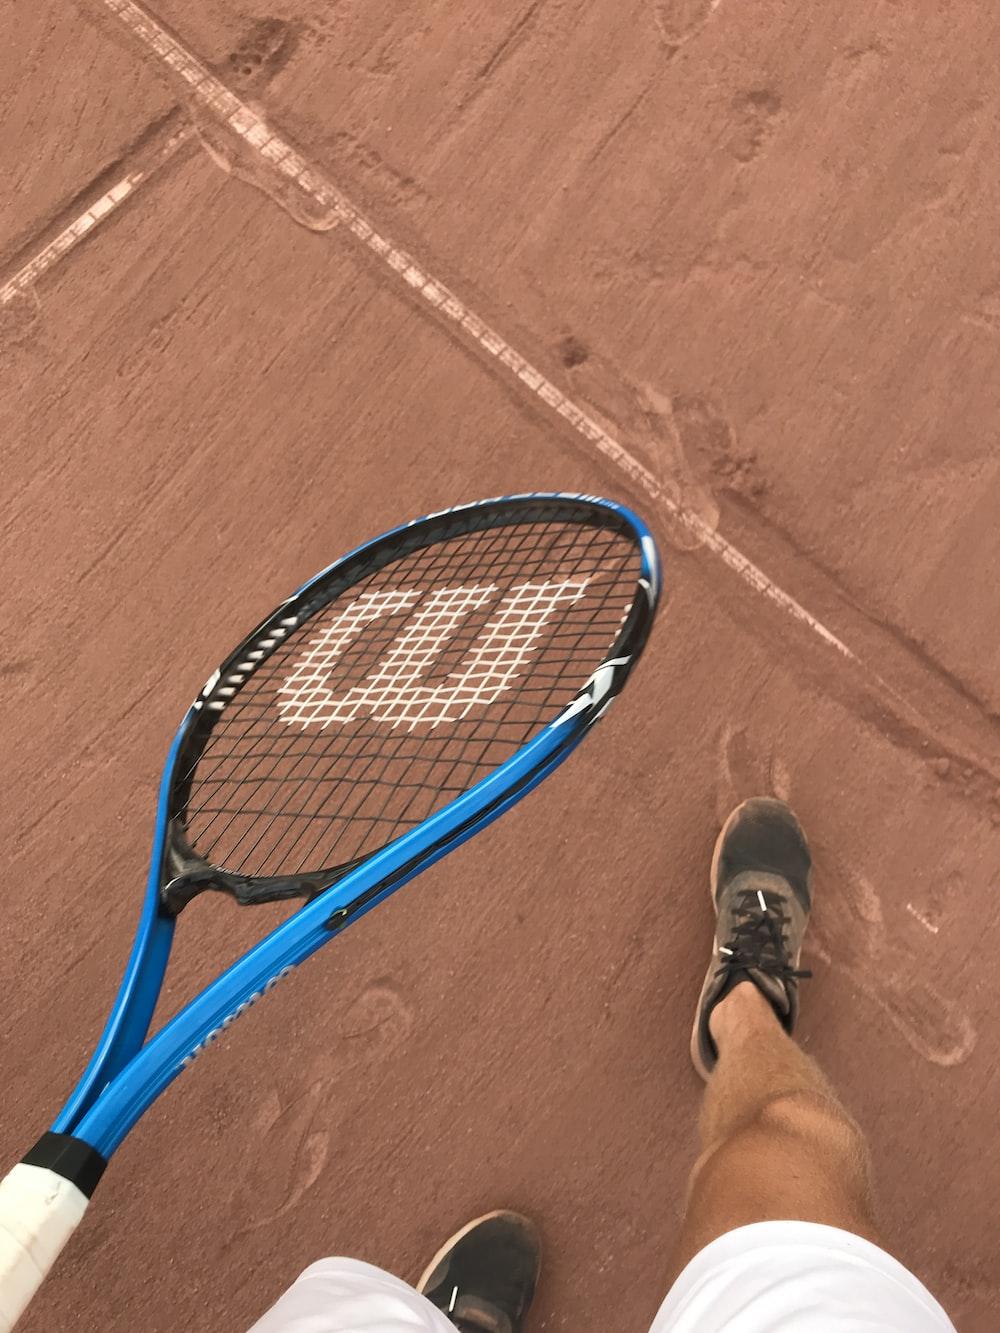 blue and black tennis racket on brown concrete floor